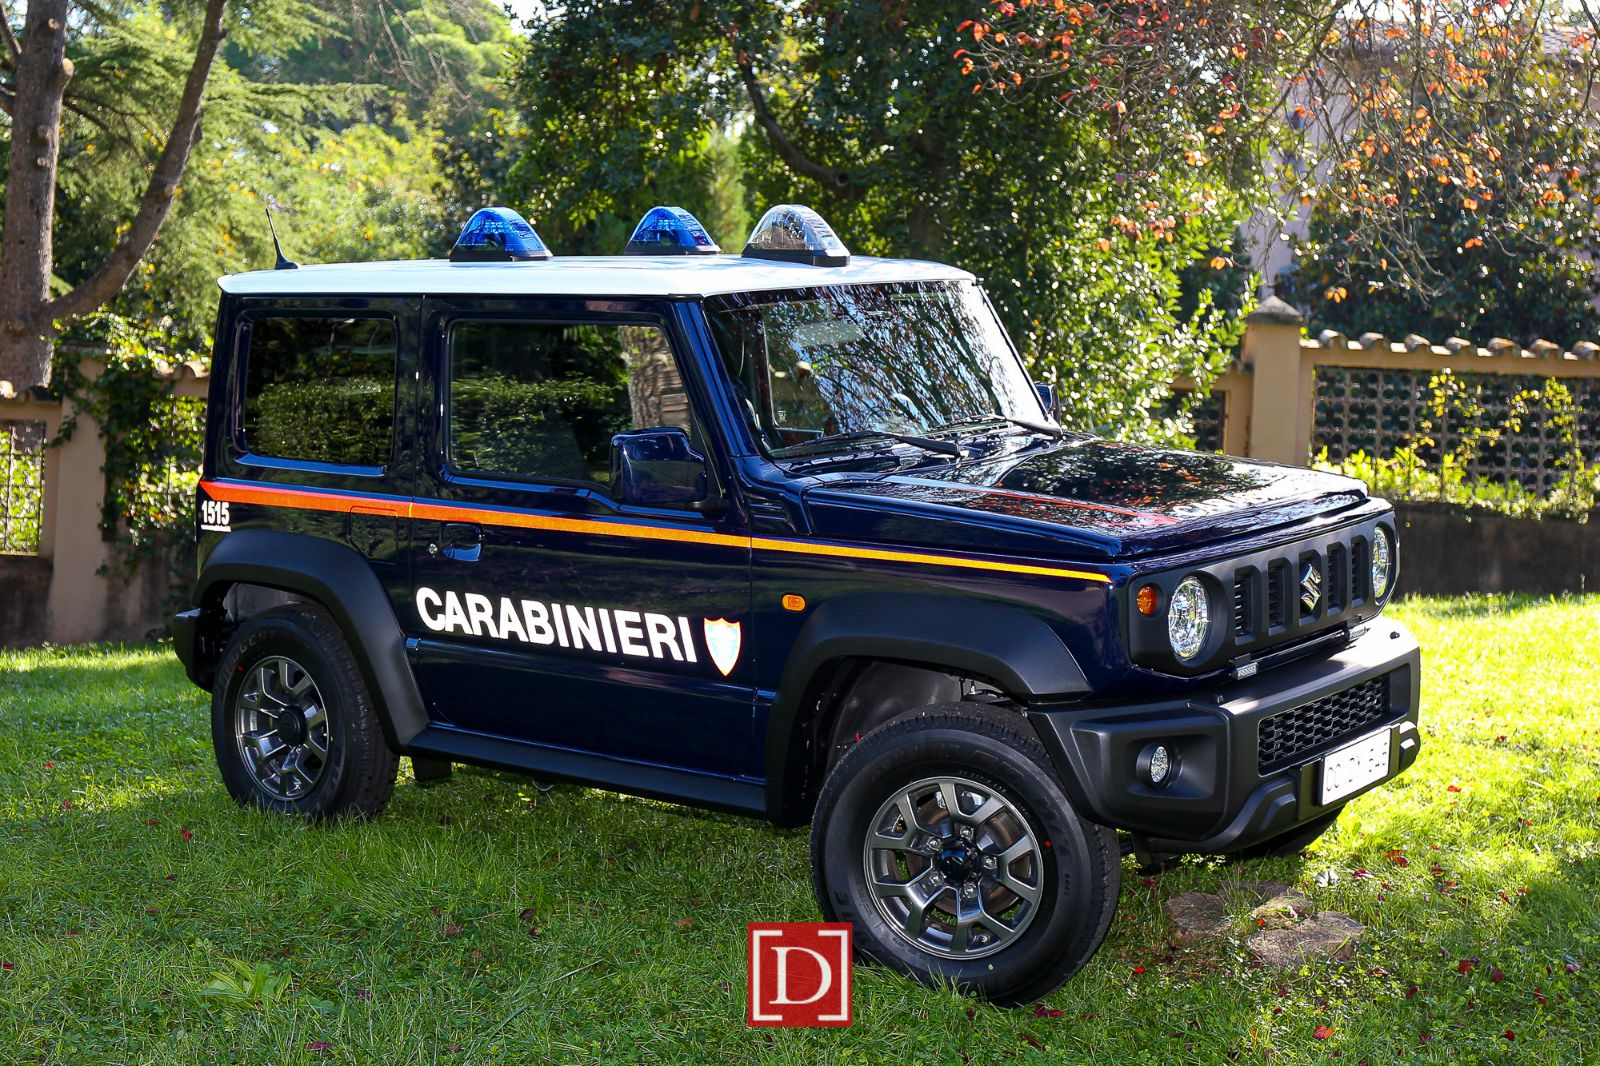 2019-10-23-suzuki-carabinieri-9133